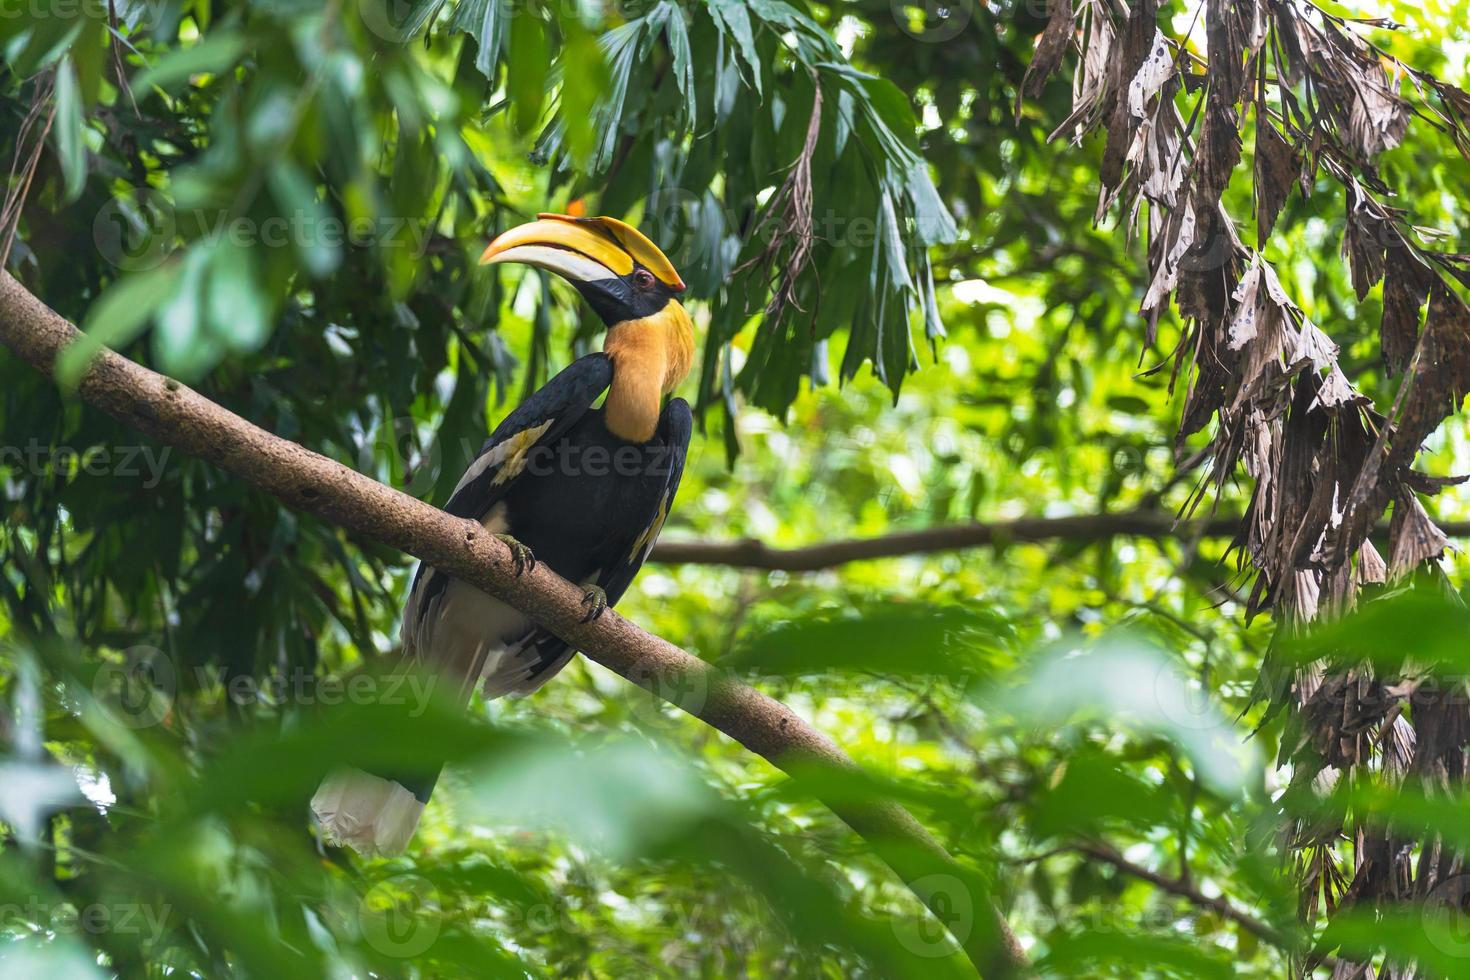 calao oiseau sur un arbre photo